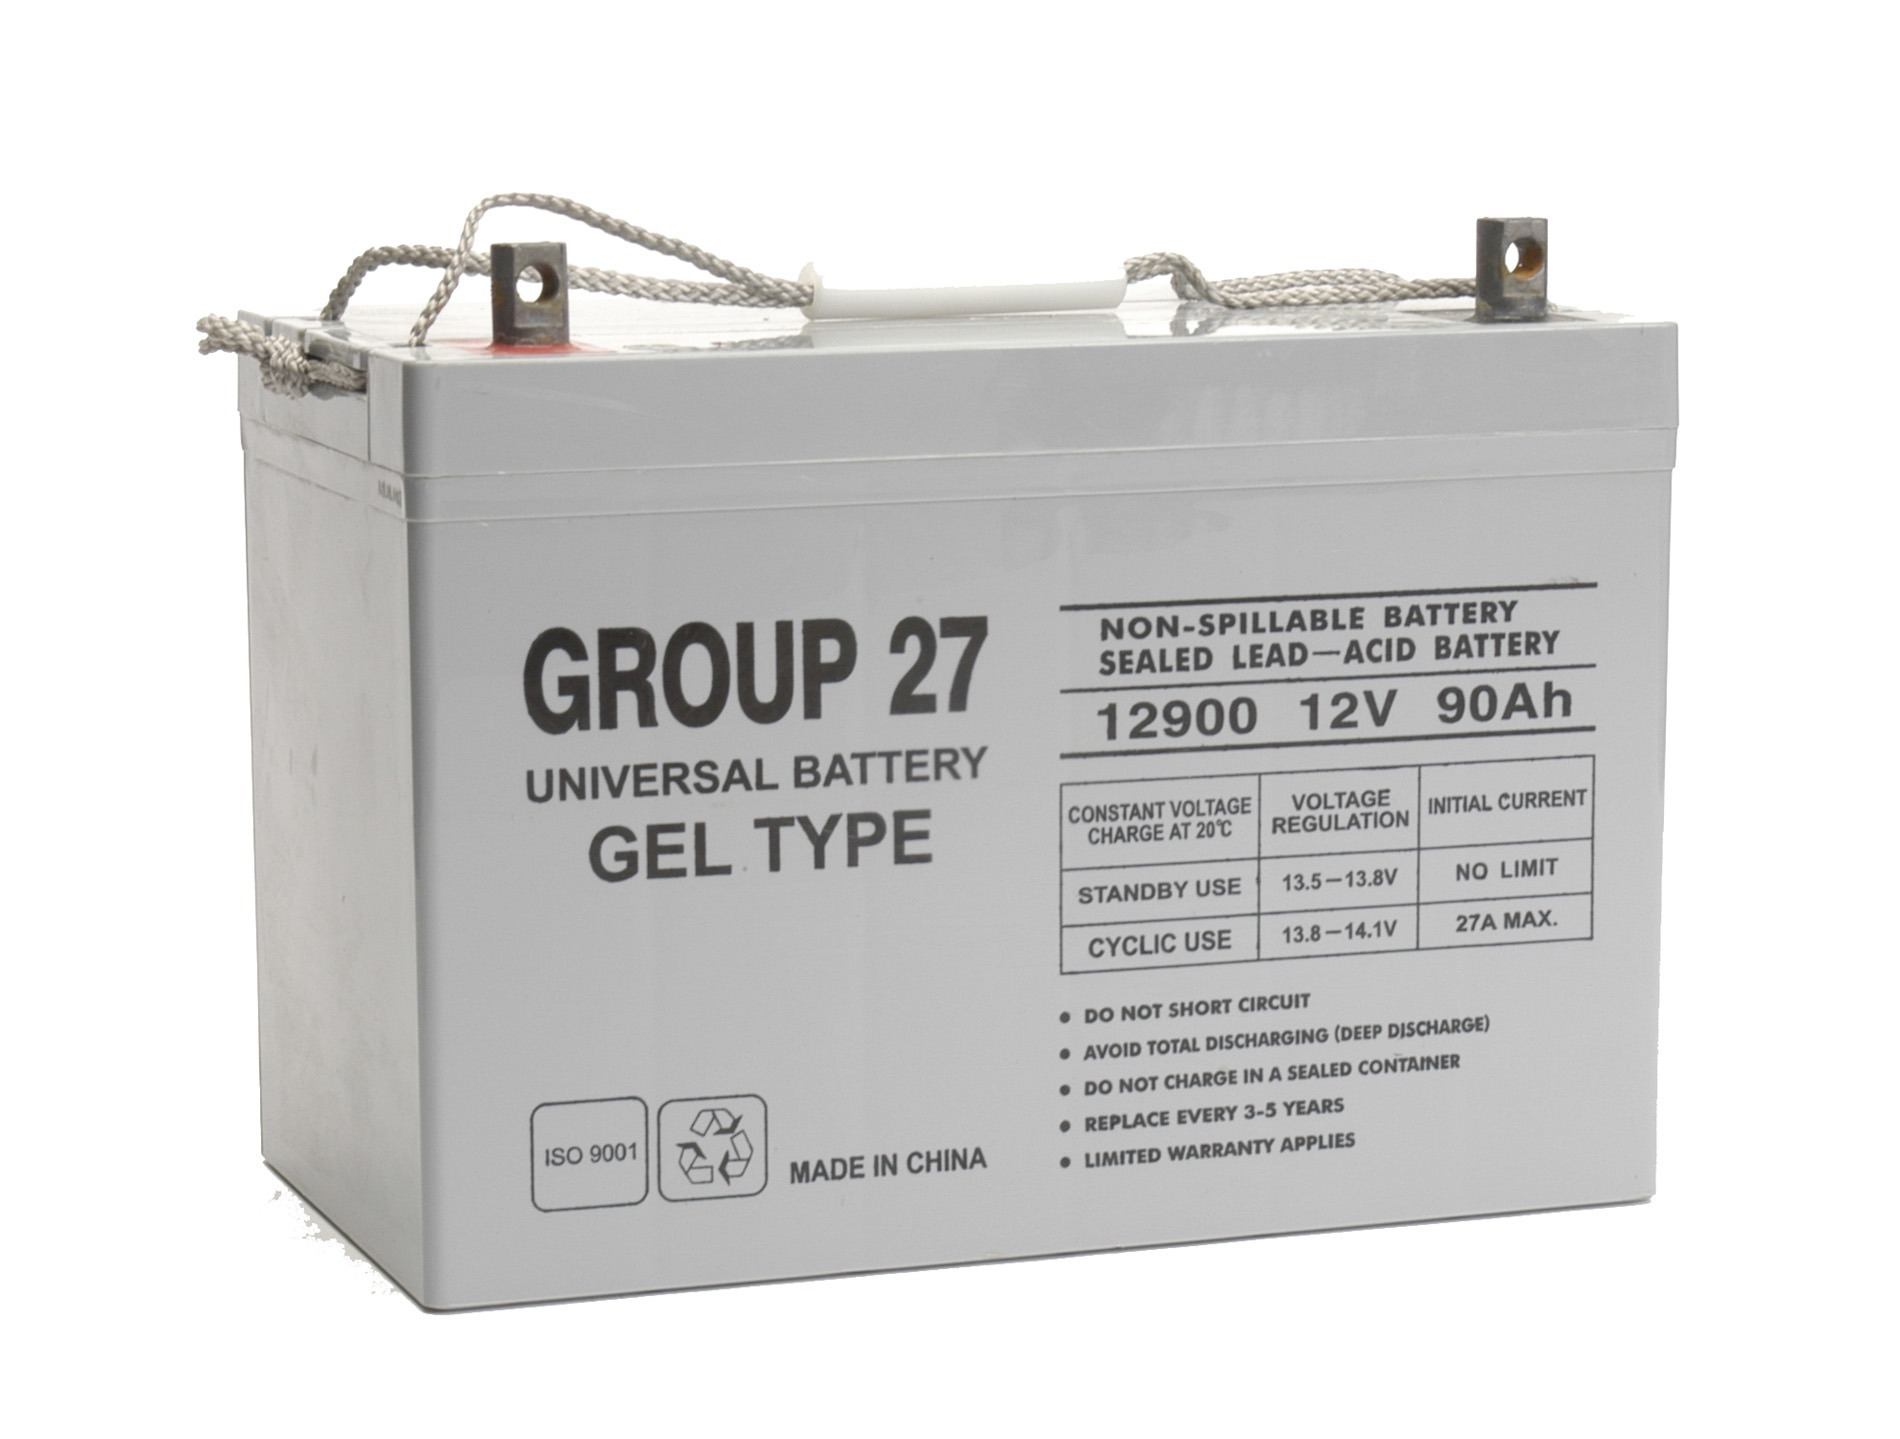 UB12900 (Group 27) 12v 90ah Gel Battery for Wheelchairs Of Kansas BCWPR